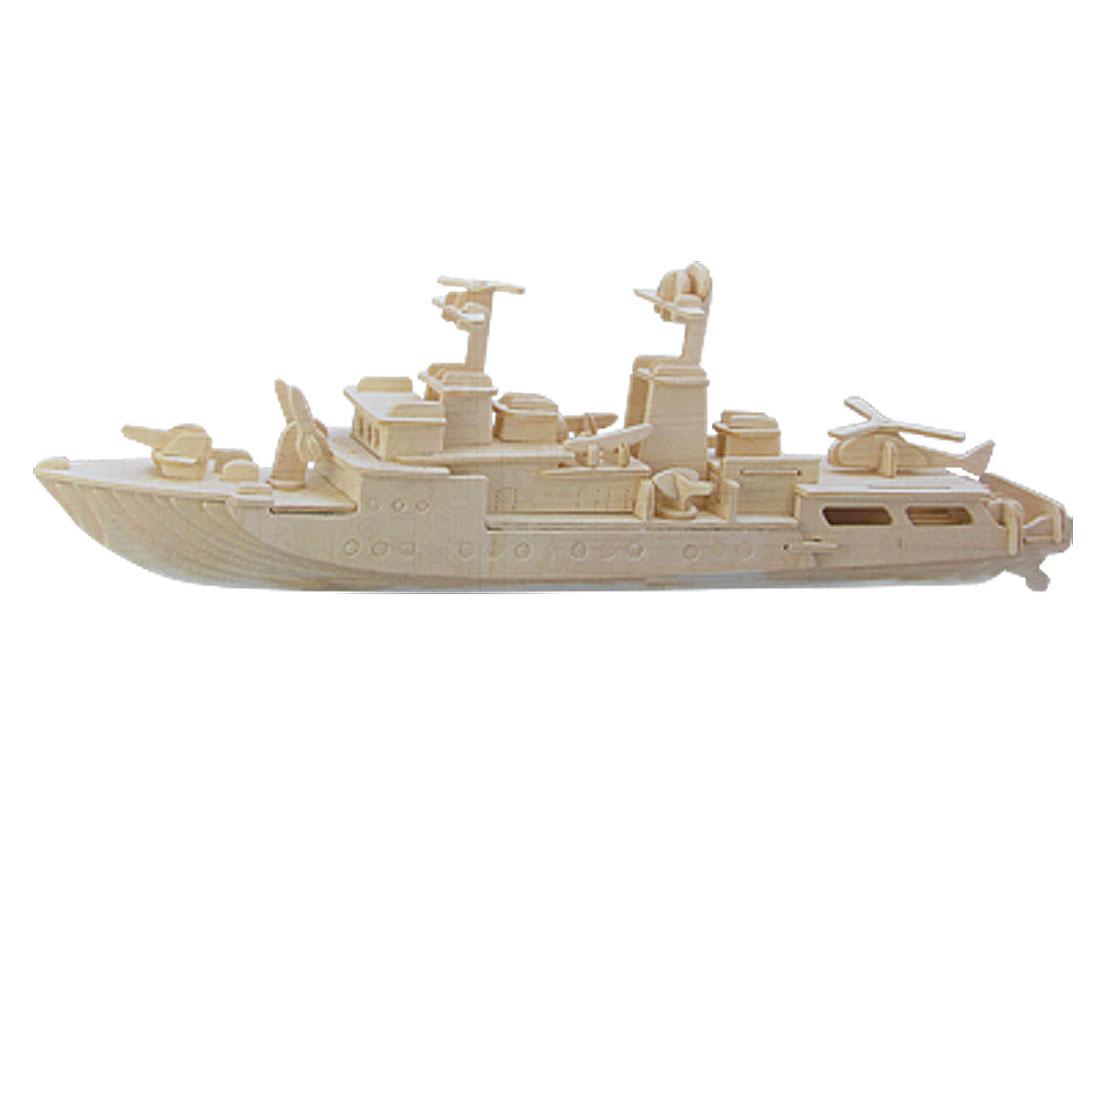 DIY 3D Wooden Destroyer Model Construction Kit Puzzle Toy